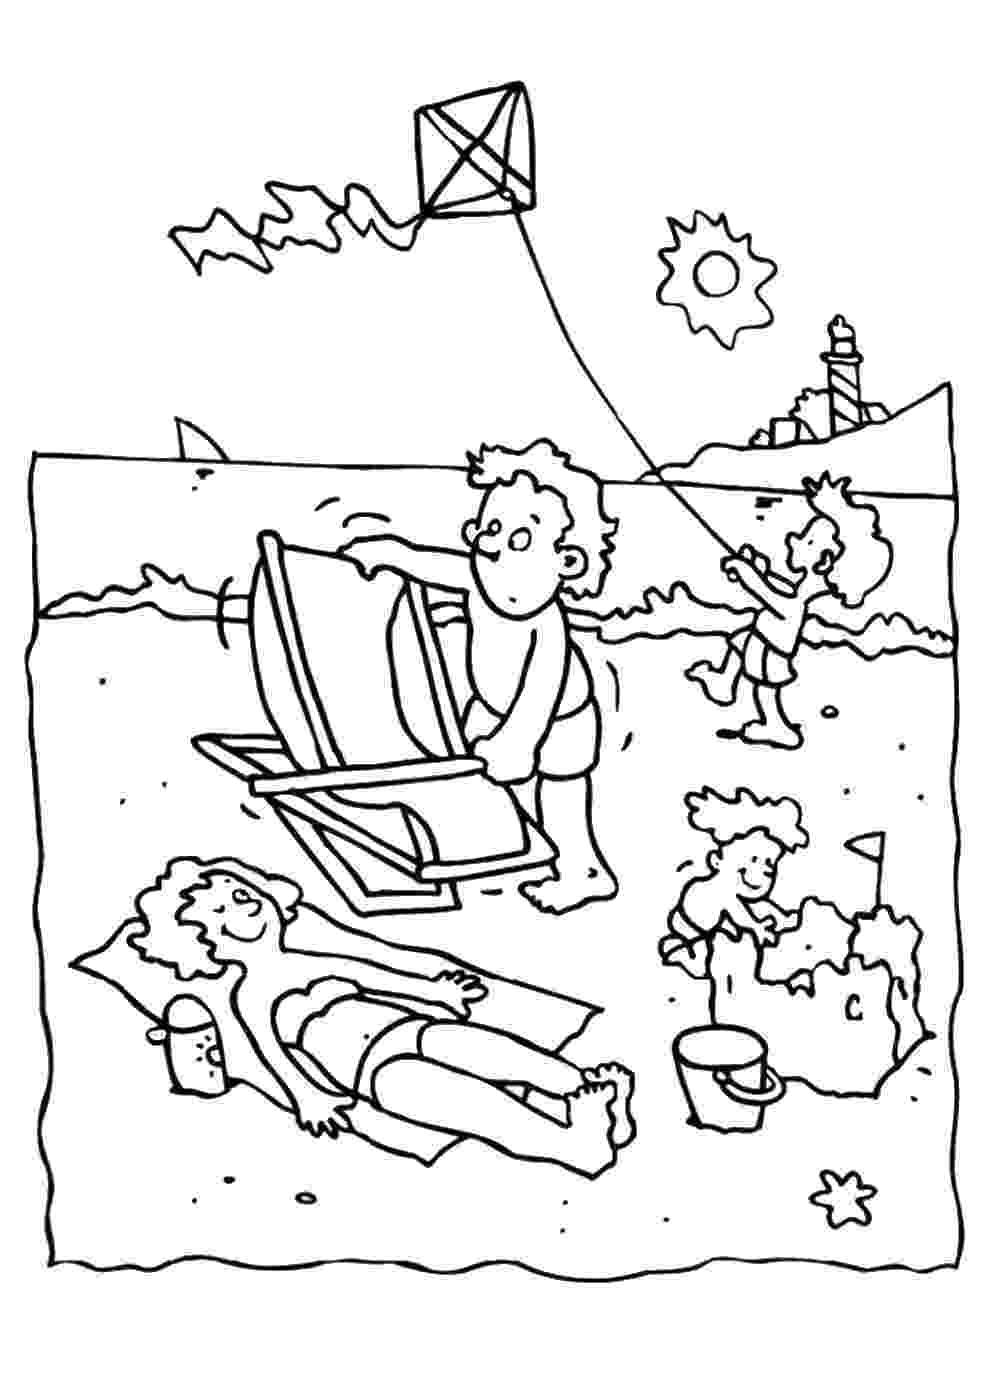 summer coloring sheets summer holiday coloring pages summer sheets coloring